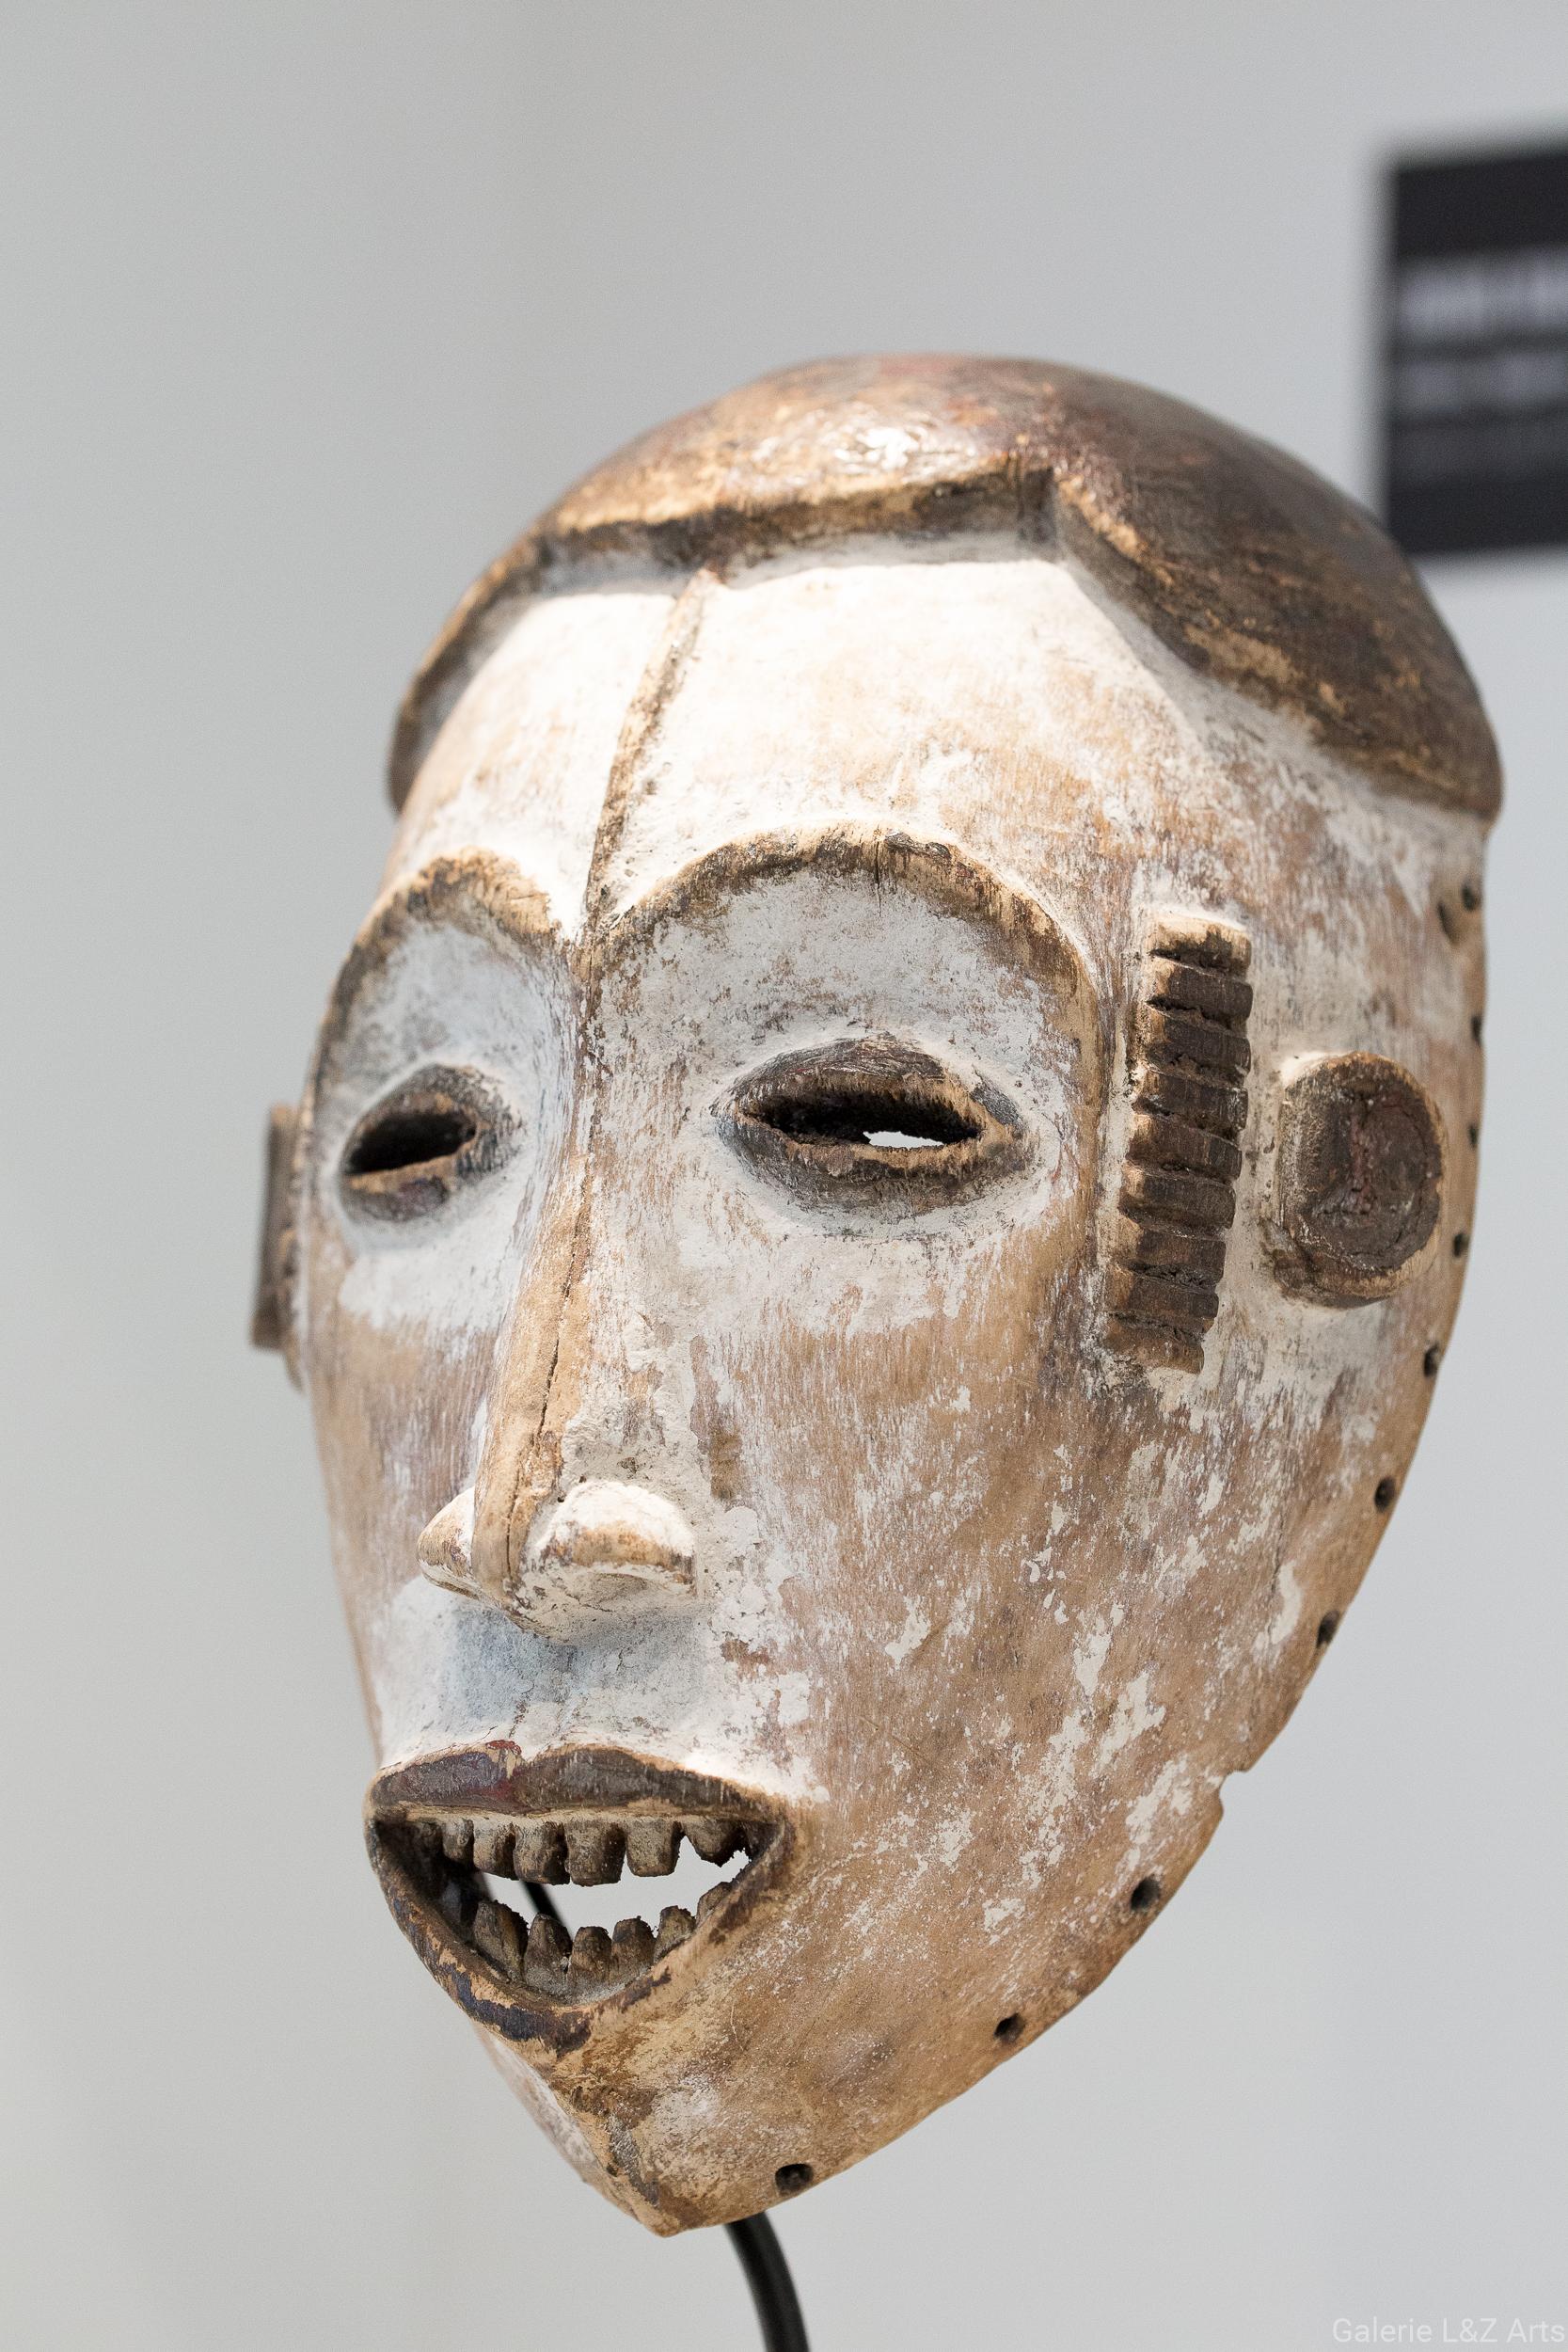 tribal-art-oostende-ostende-exposition-galerie-lz-art-africain-belgique-15.jpg